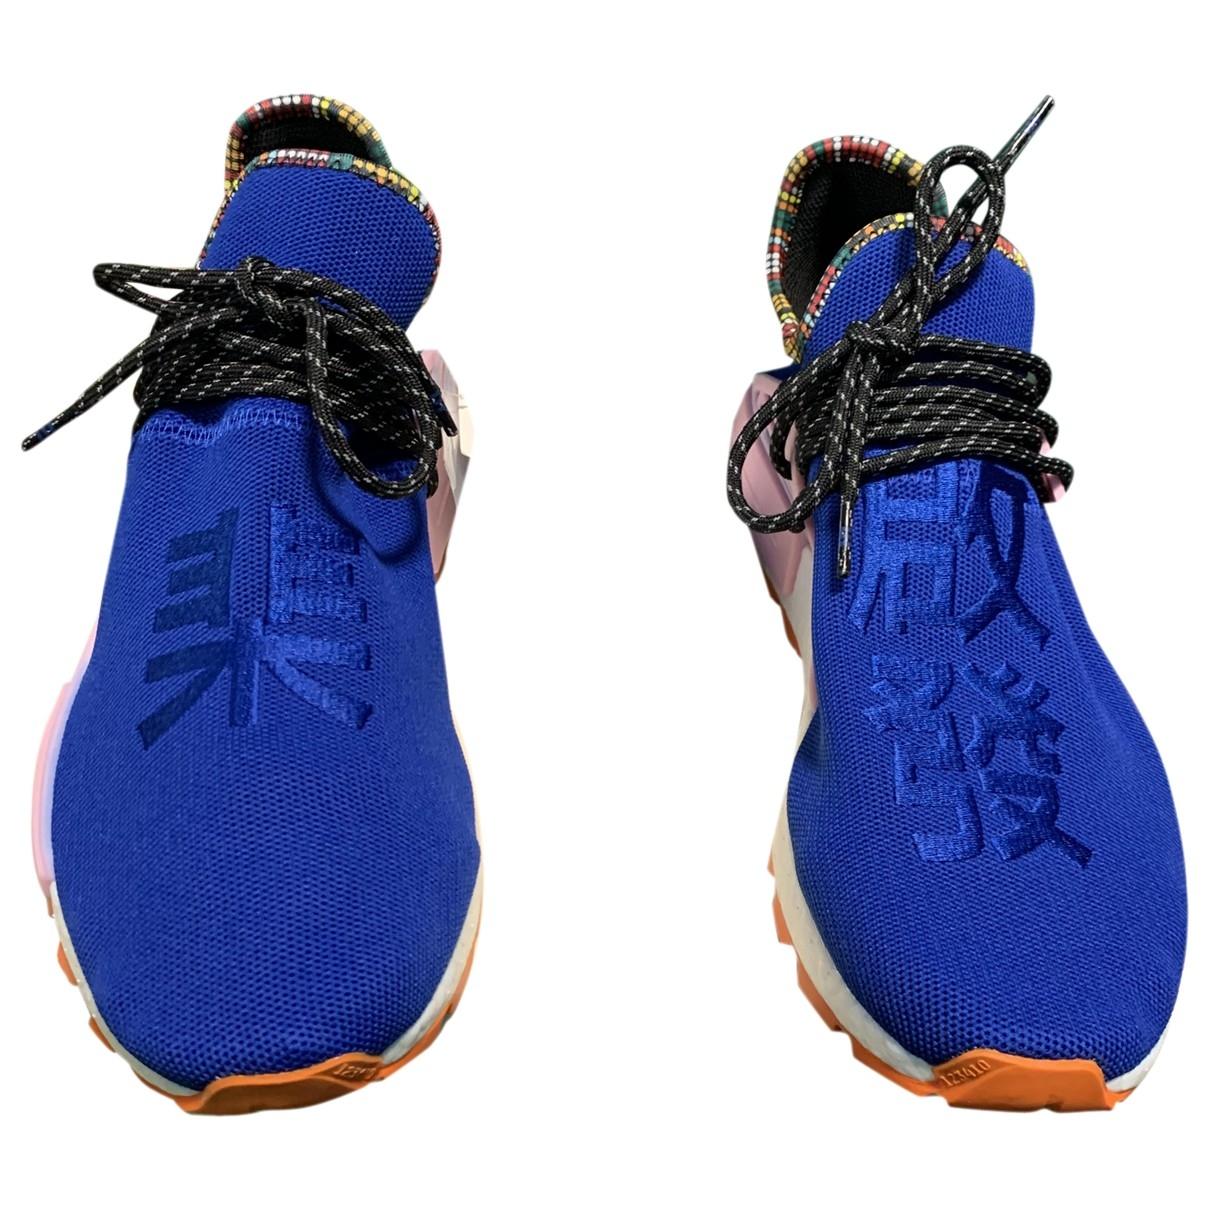 Adidas X Pharrell Williams - Baskets NMD Hu pour homme en suede - bleu